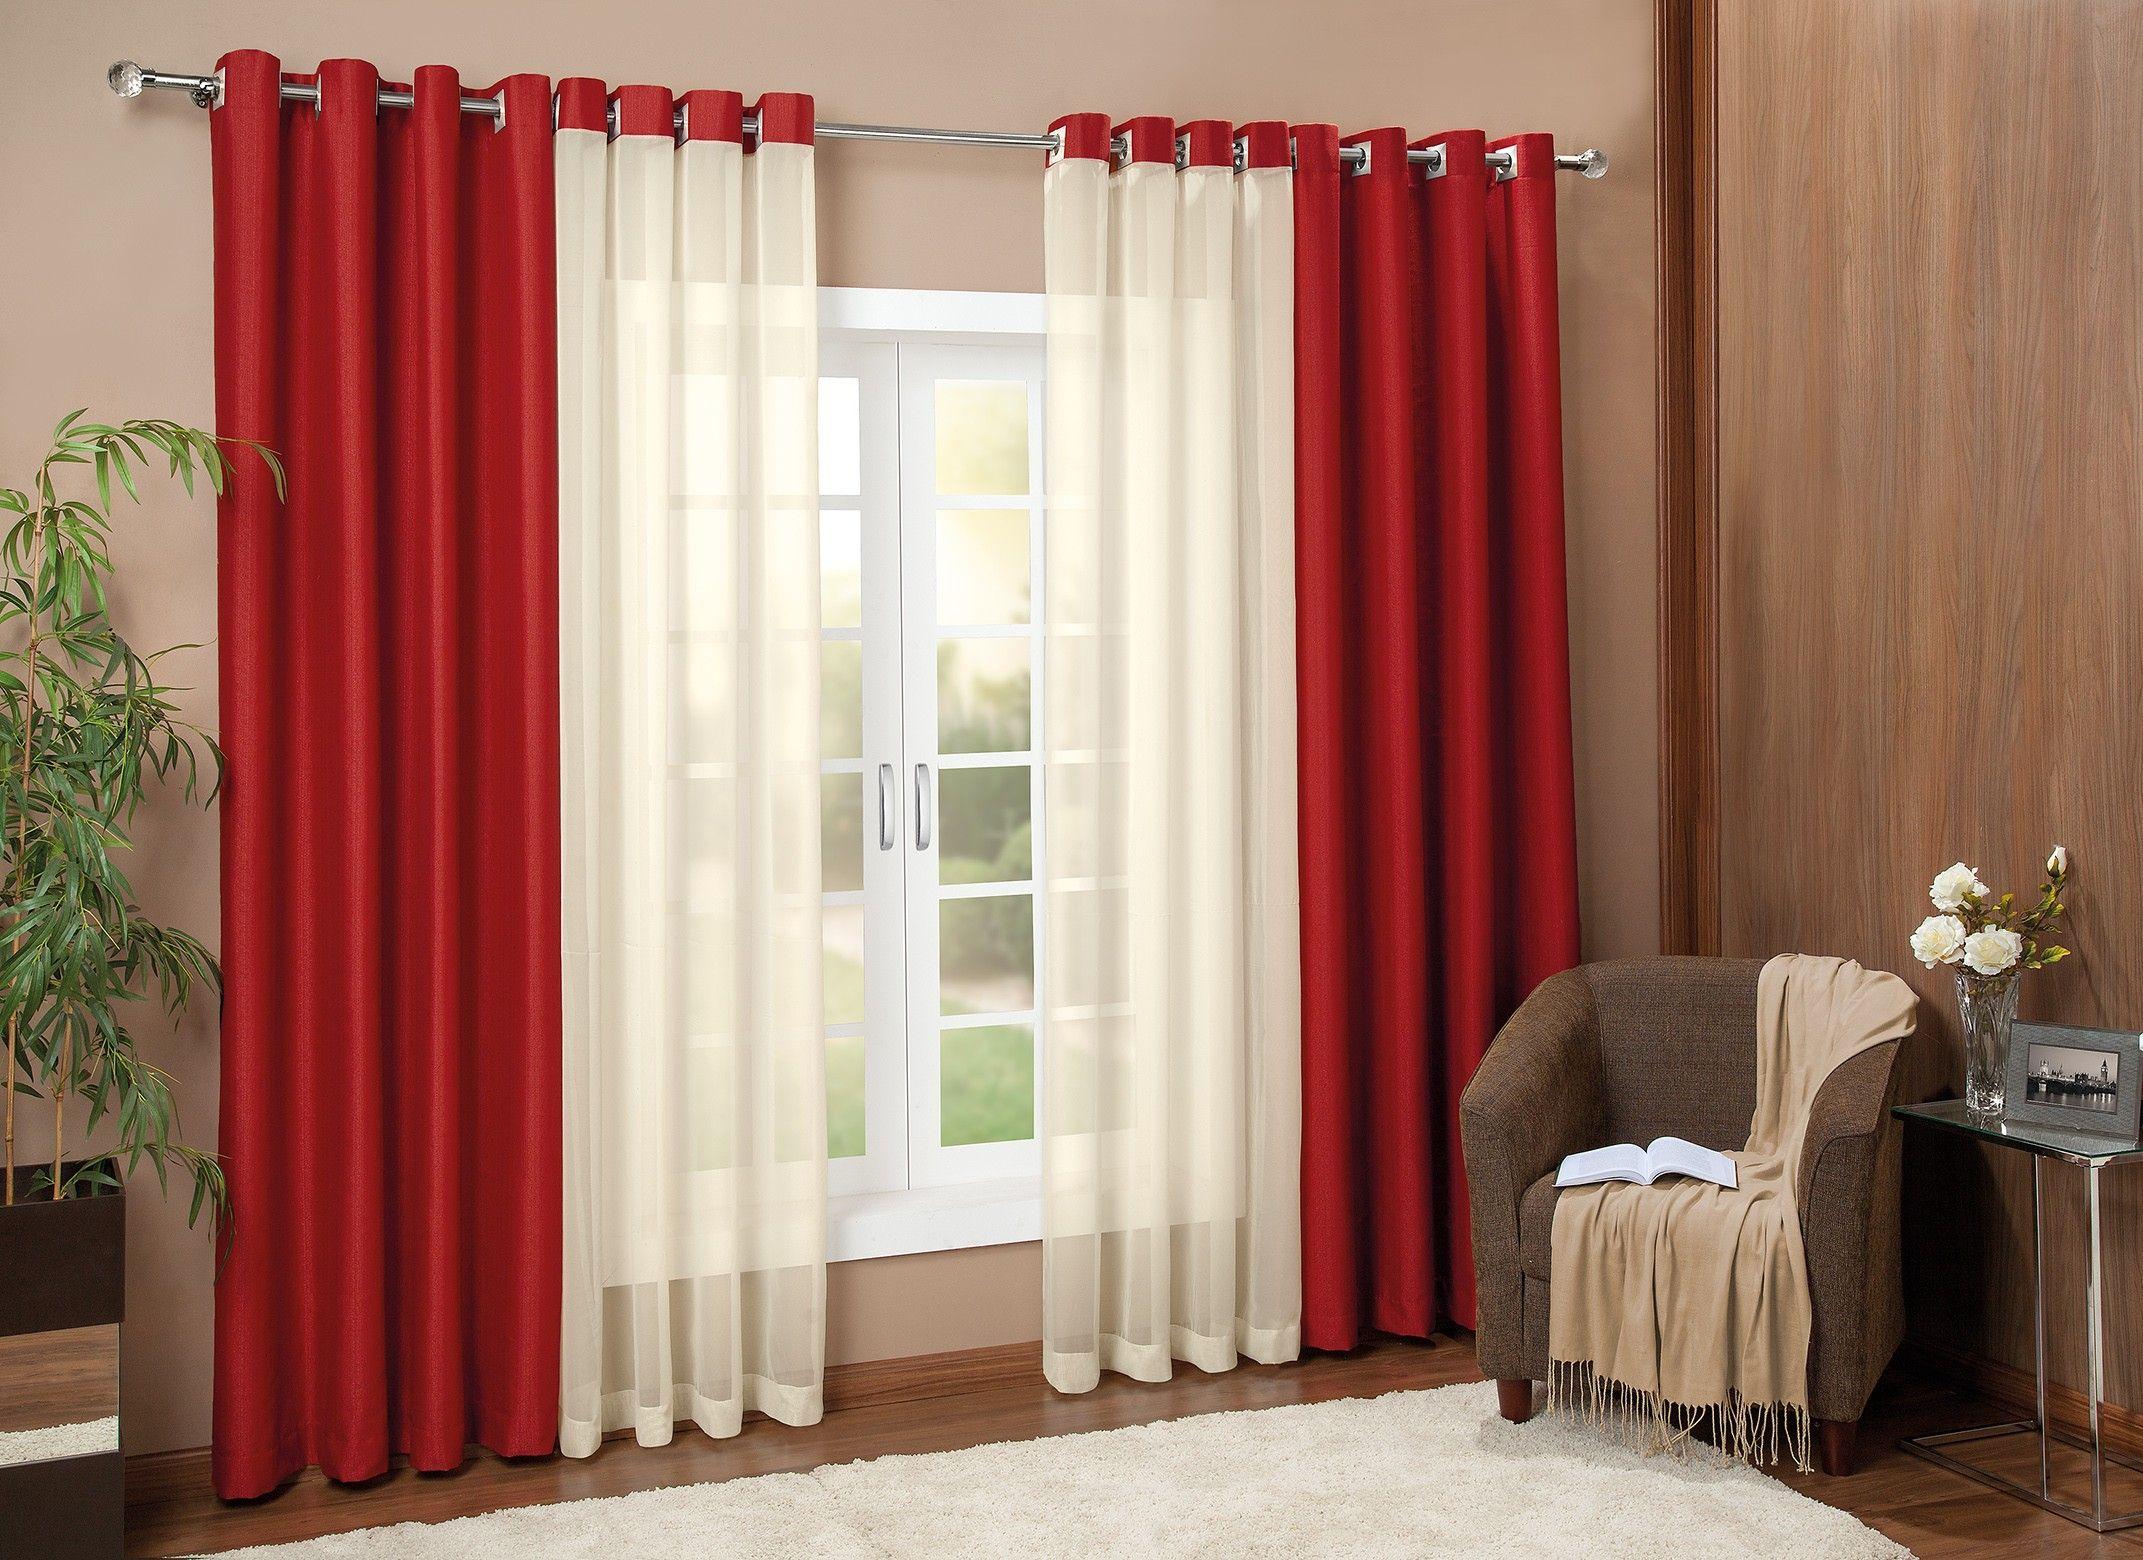 Cortina siena 3 00m x 2 50m p var o simples cortinas for Cortinas para departamentos pequenos